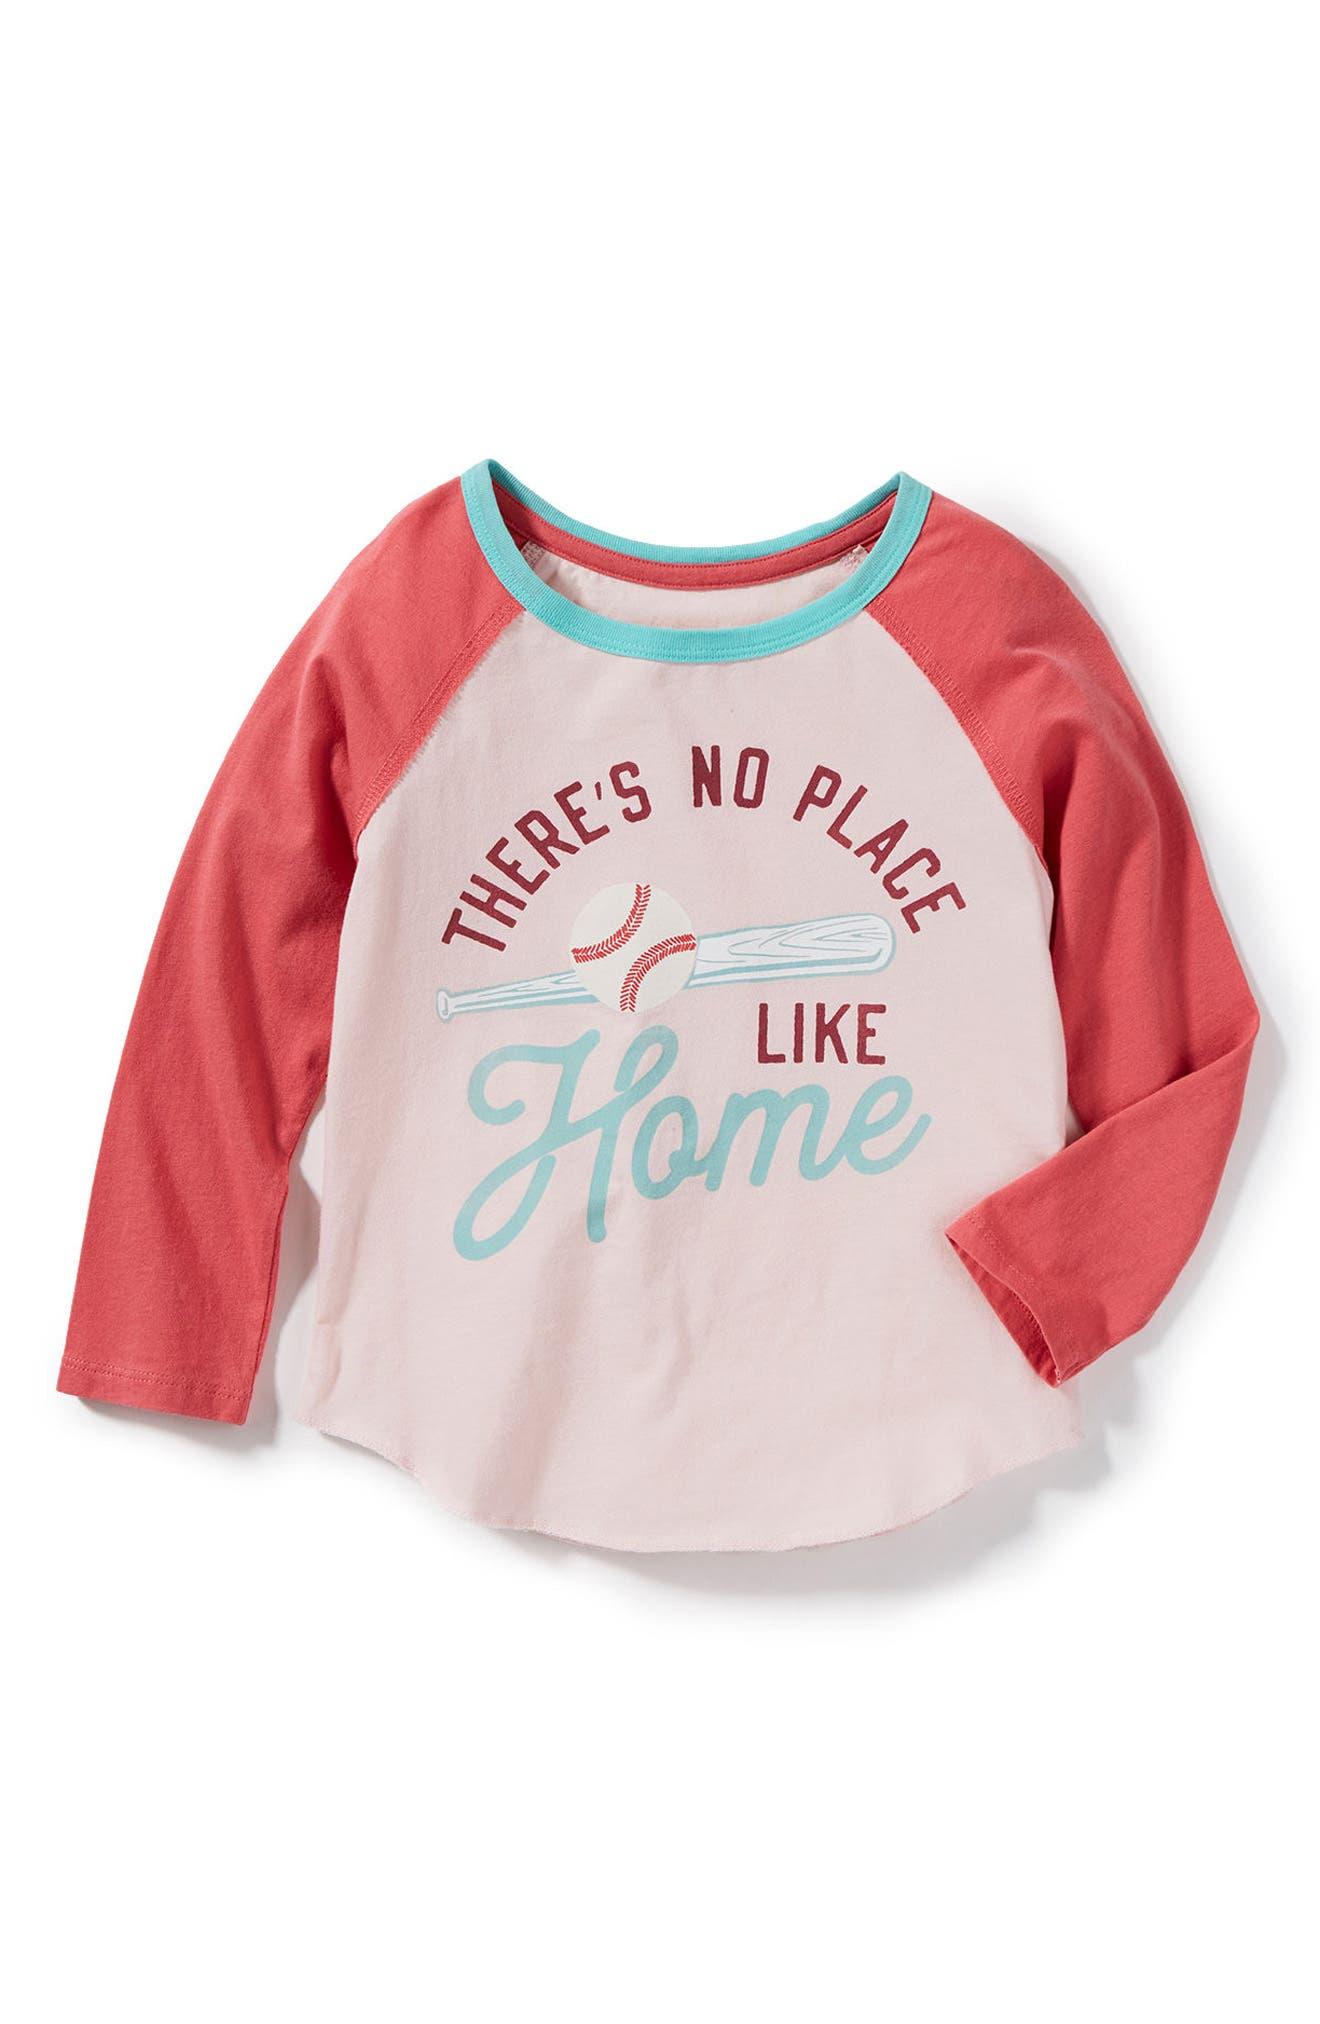 No Place Like Home Baseball Tee,                             Main thumbnail 1, color,                             Coral